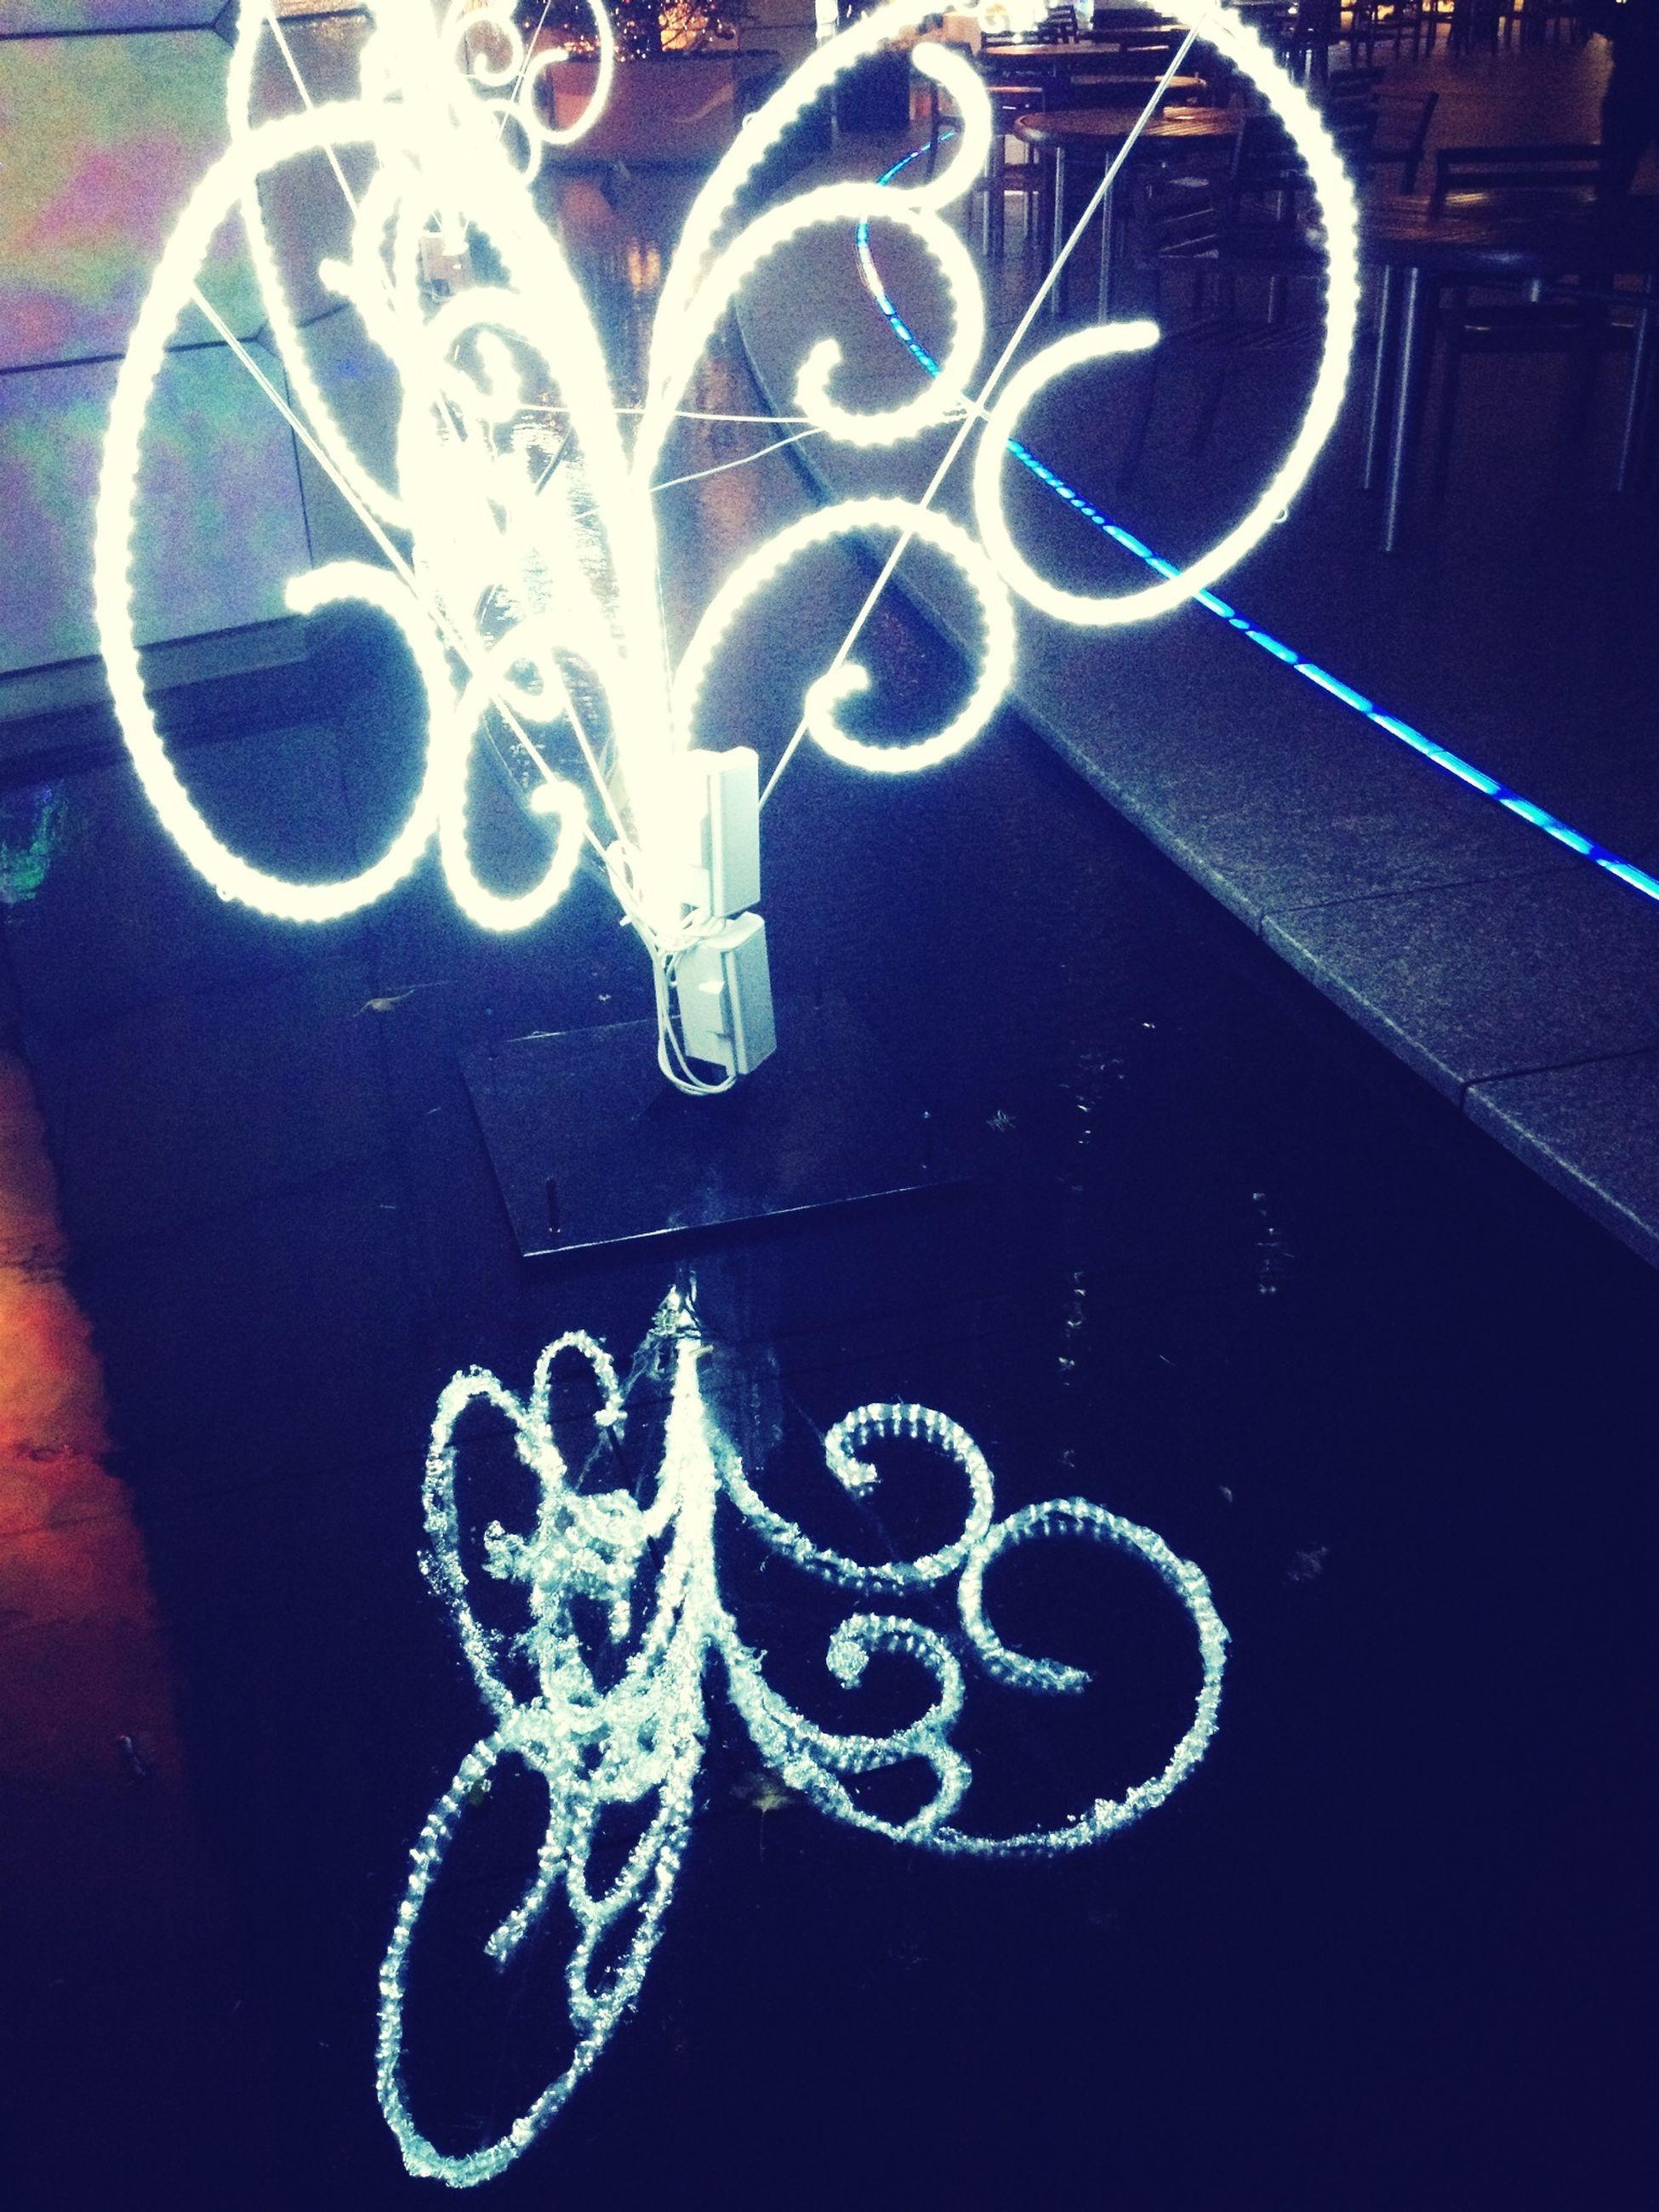 creativity, art, art and craft, text, western script, close-up, human representation, communication, indoors, graffiti, high angle view, animal representation, no people, craft, still life, capital letter, ideas, symbol